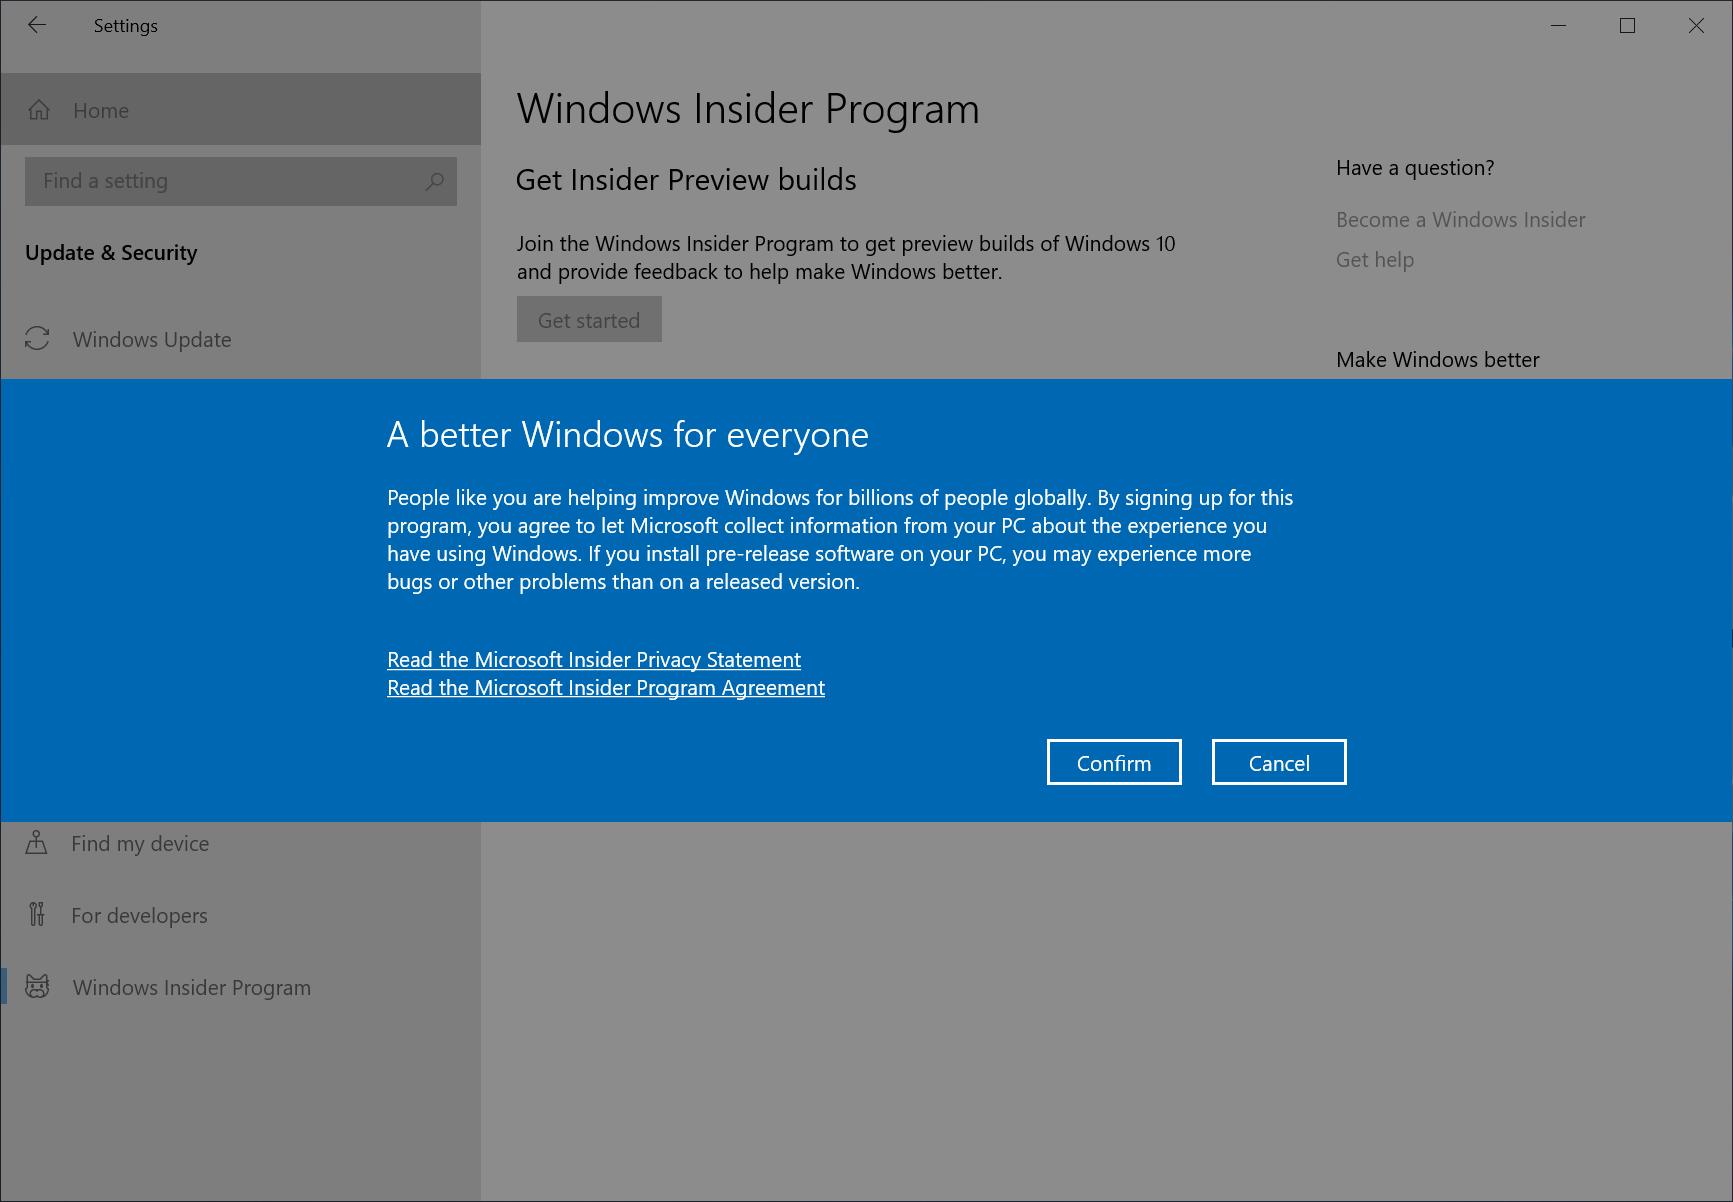 Windows 10 November 8, 2019 update breaks GoogleEarth 8cc54b9bc368b29961a9dcf6641c0a68.png